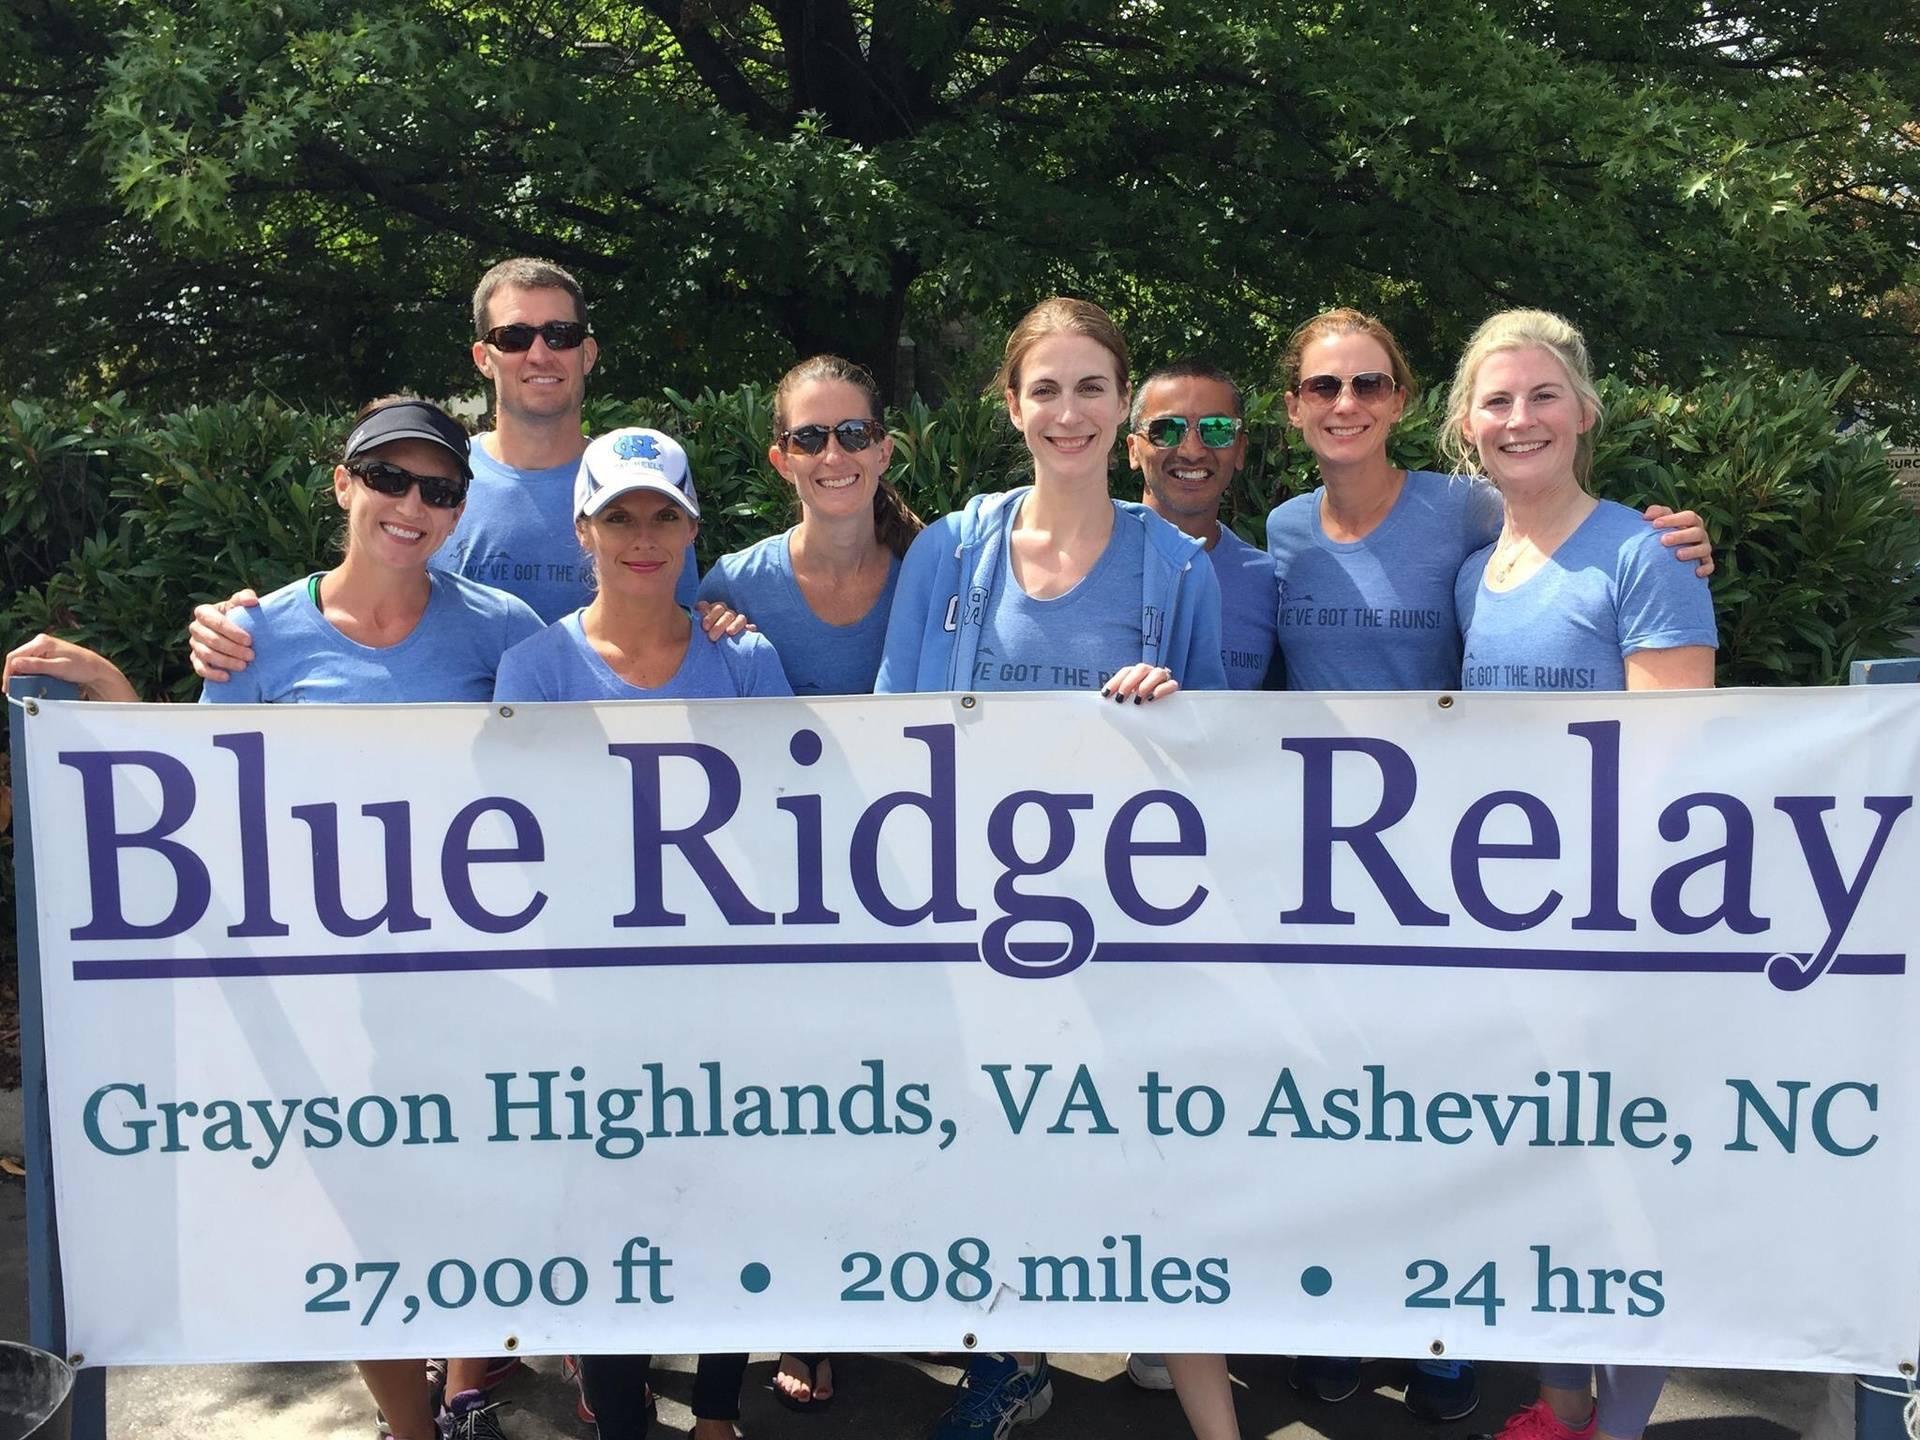 Blue Ridge Relay